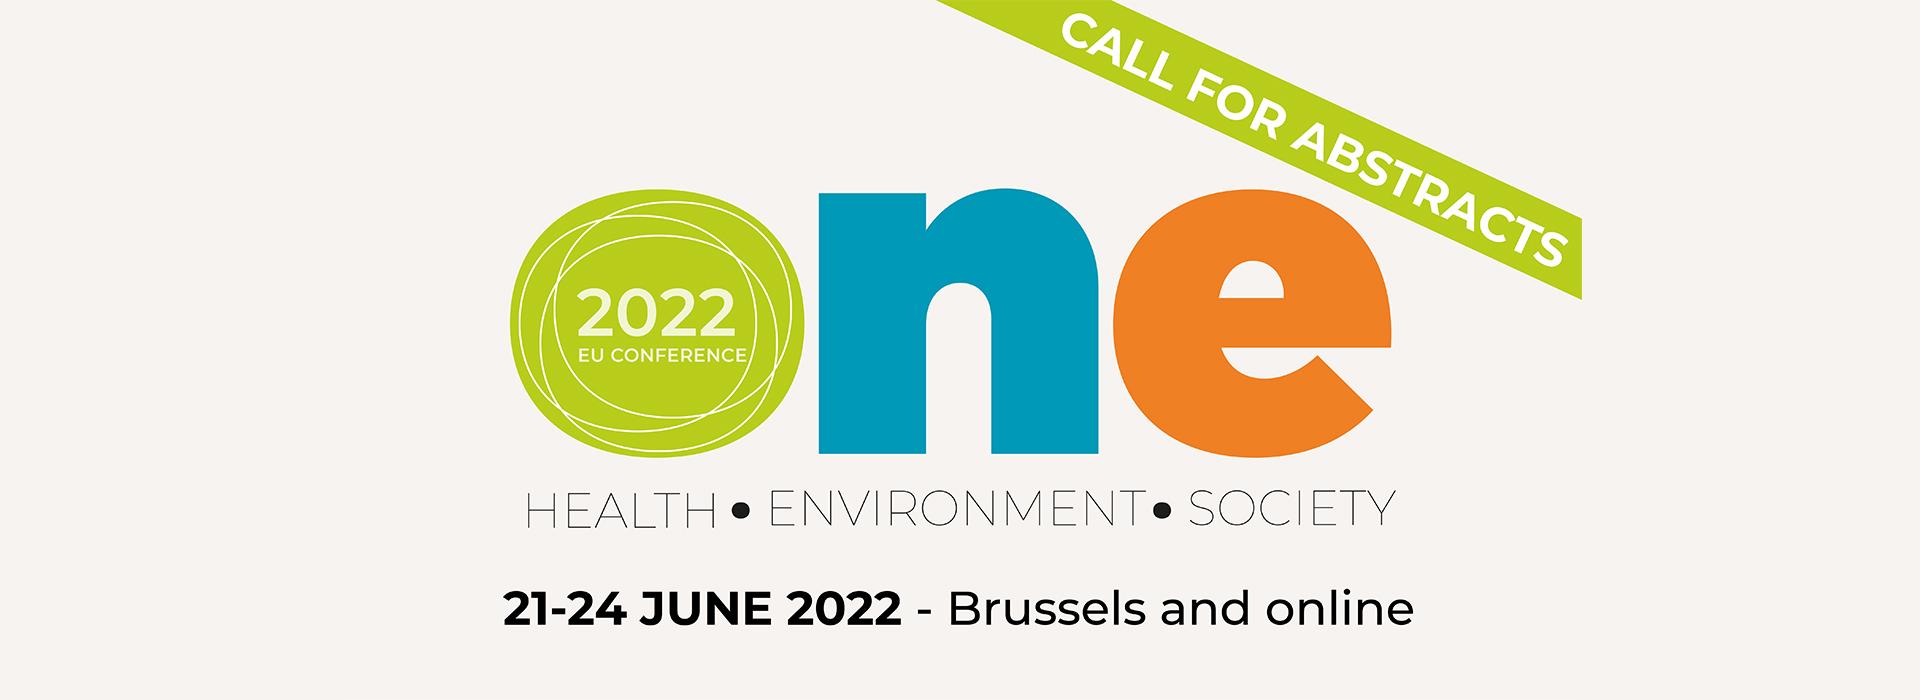 Предстояща конференция ONE – Health, Environment, Society – Conference 2022